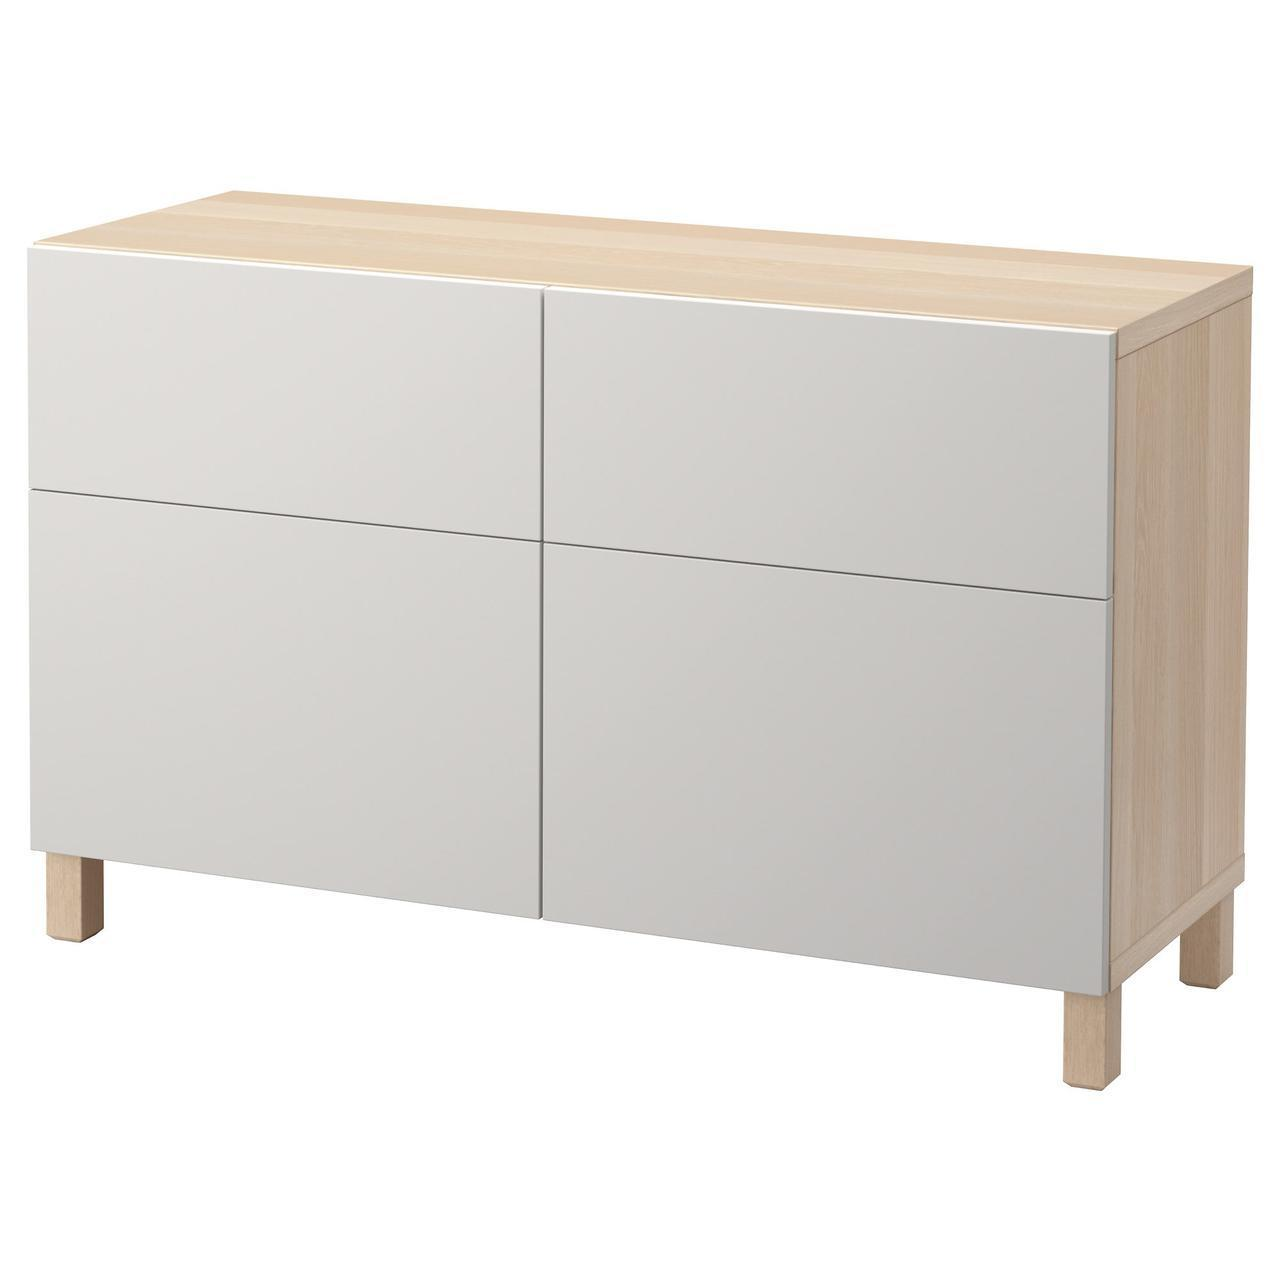 Тумба IKEA BESTÅ 120x40x74 см Lappviken беленый дуб светло-серая 492.049.01